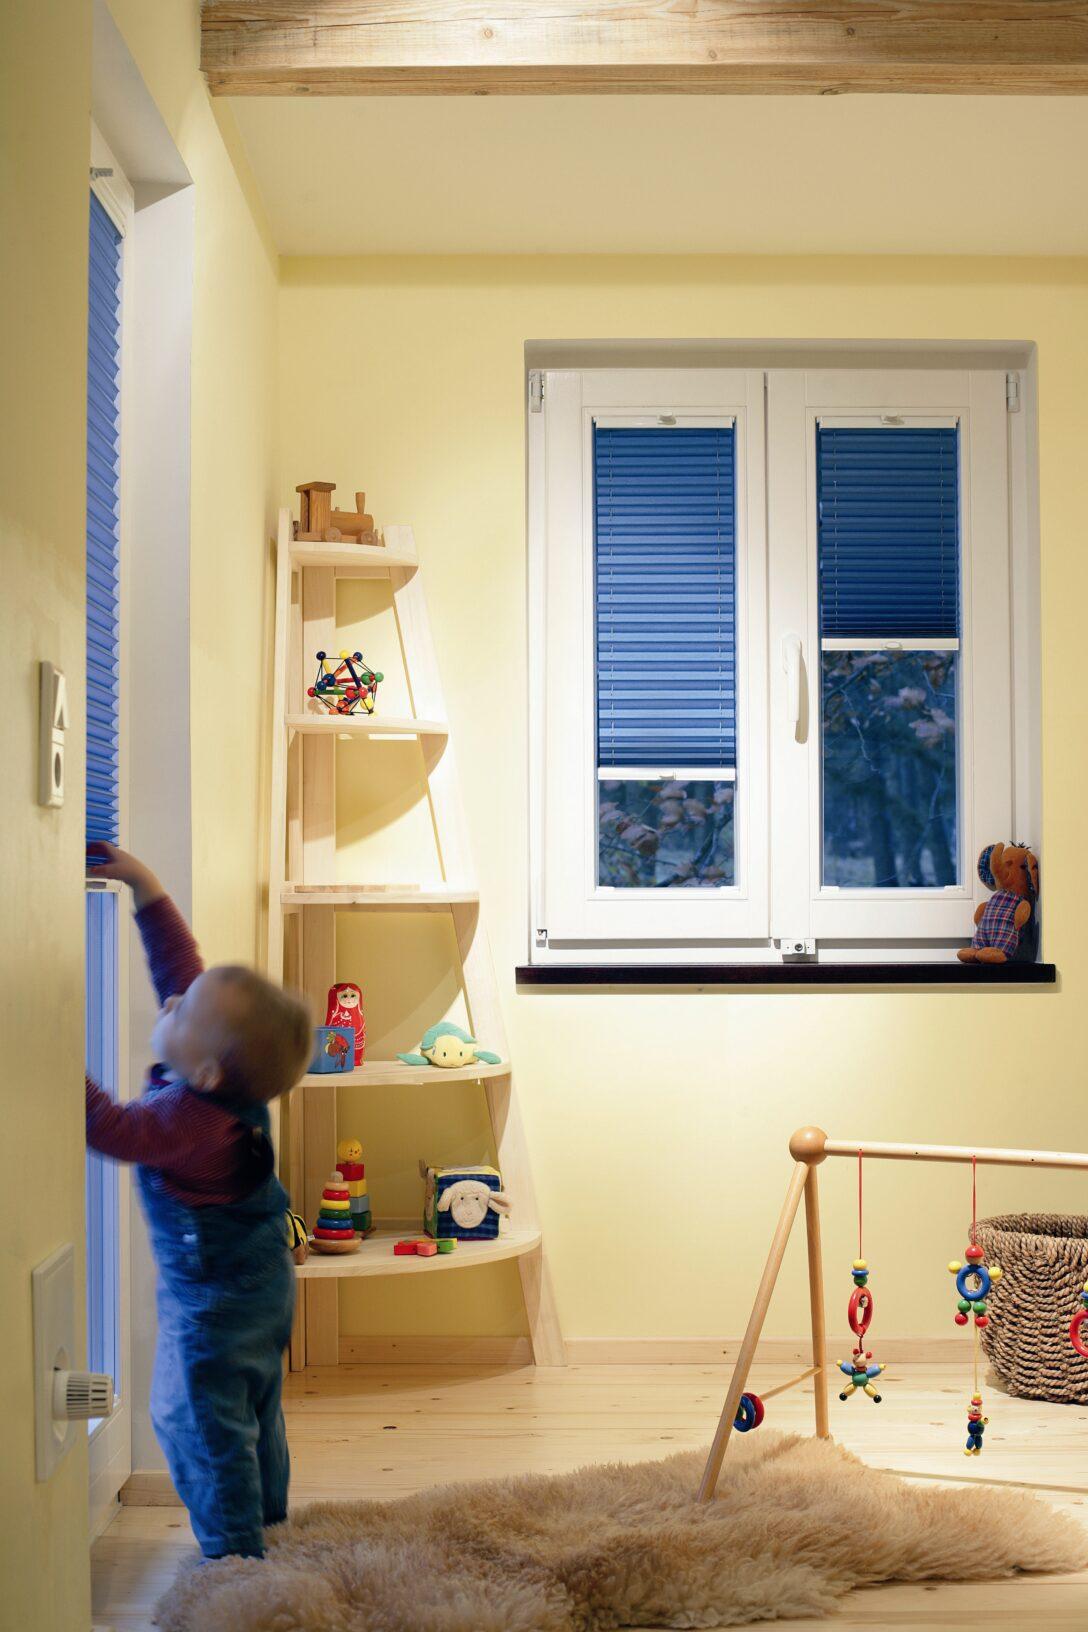 Large Size of Bildergalerie Plissee Wabenplissee Rollomeisterde Regale Kinderzimmer Regal Weiß Fenster Sofa Kinderzimmer Plissee Kinderzimmer